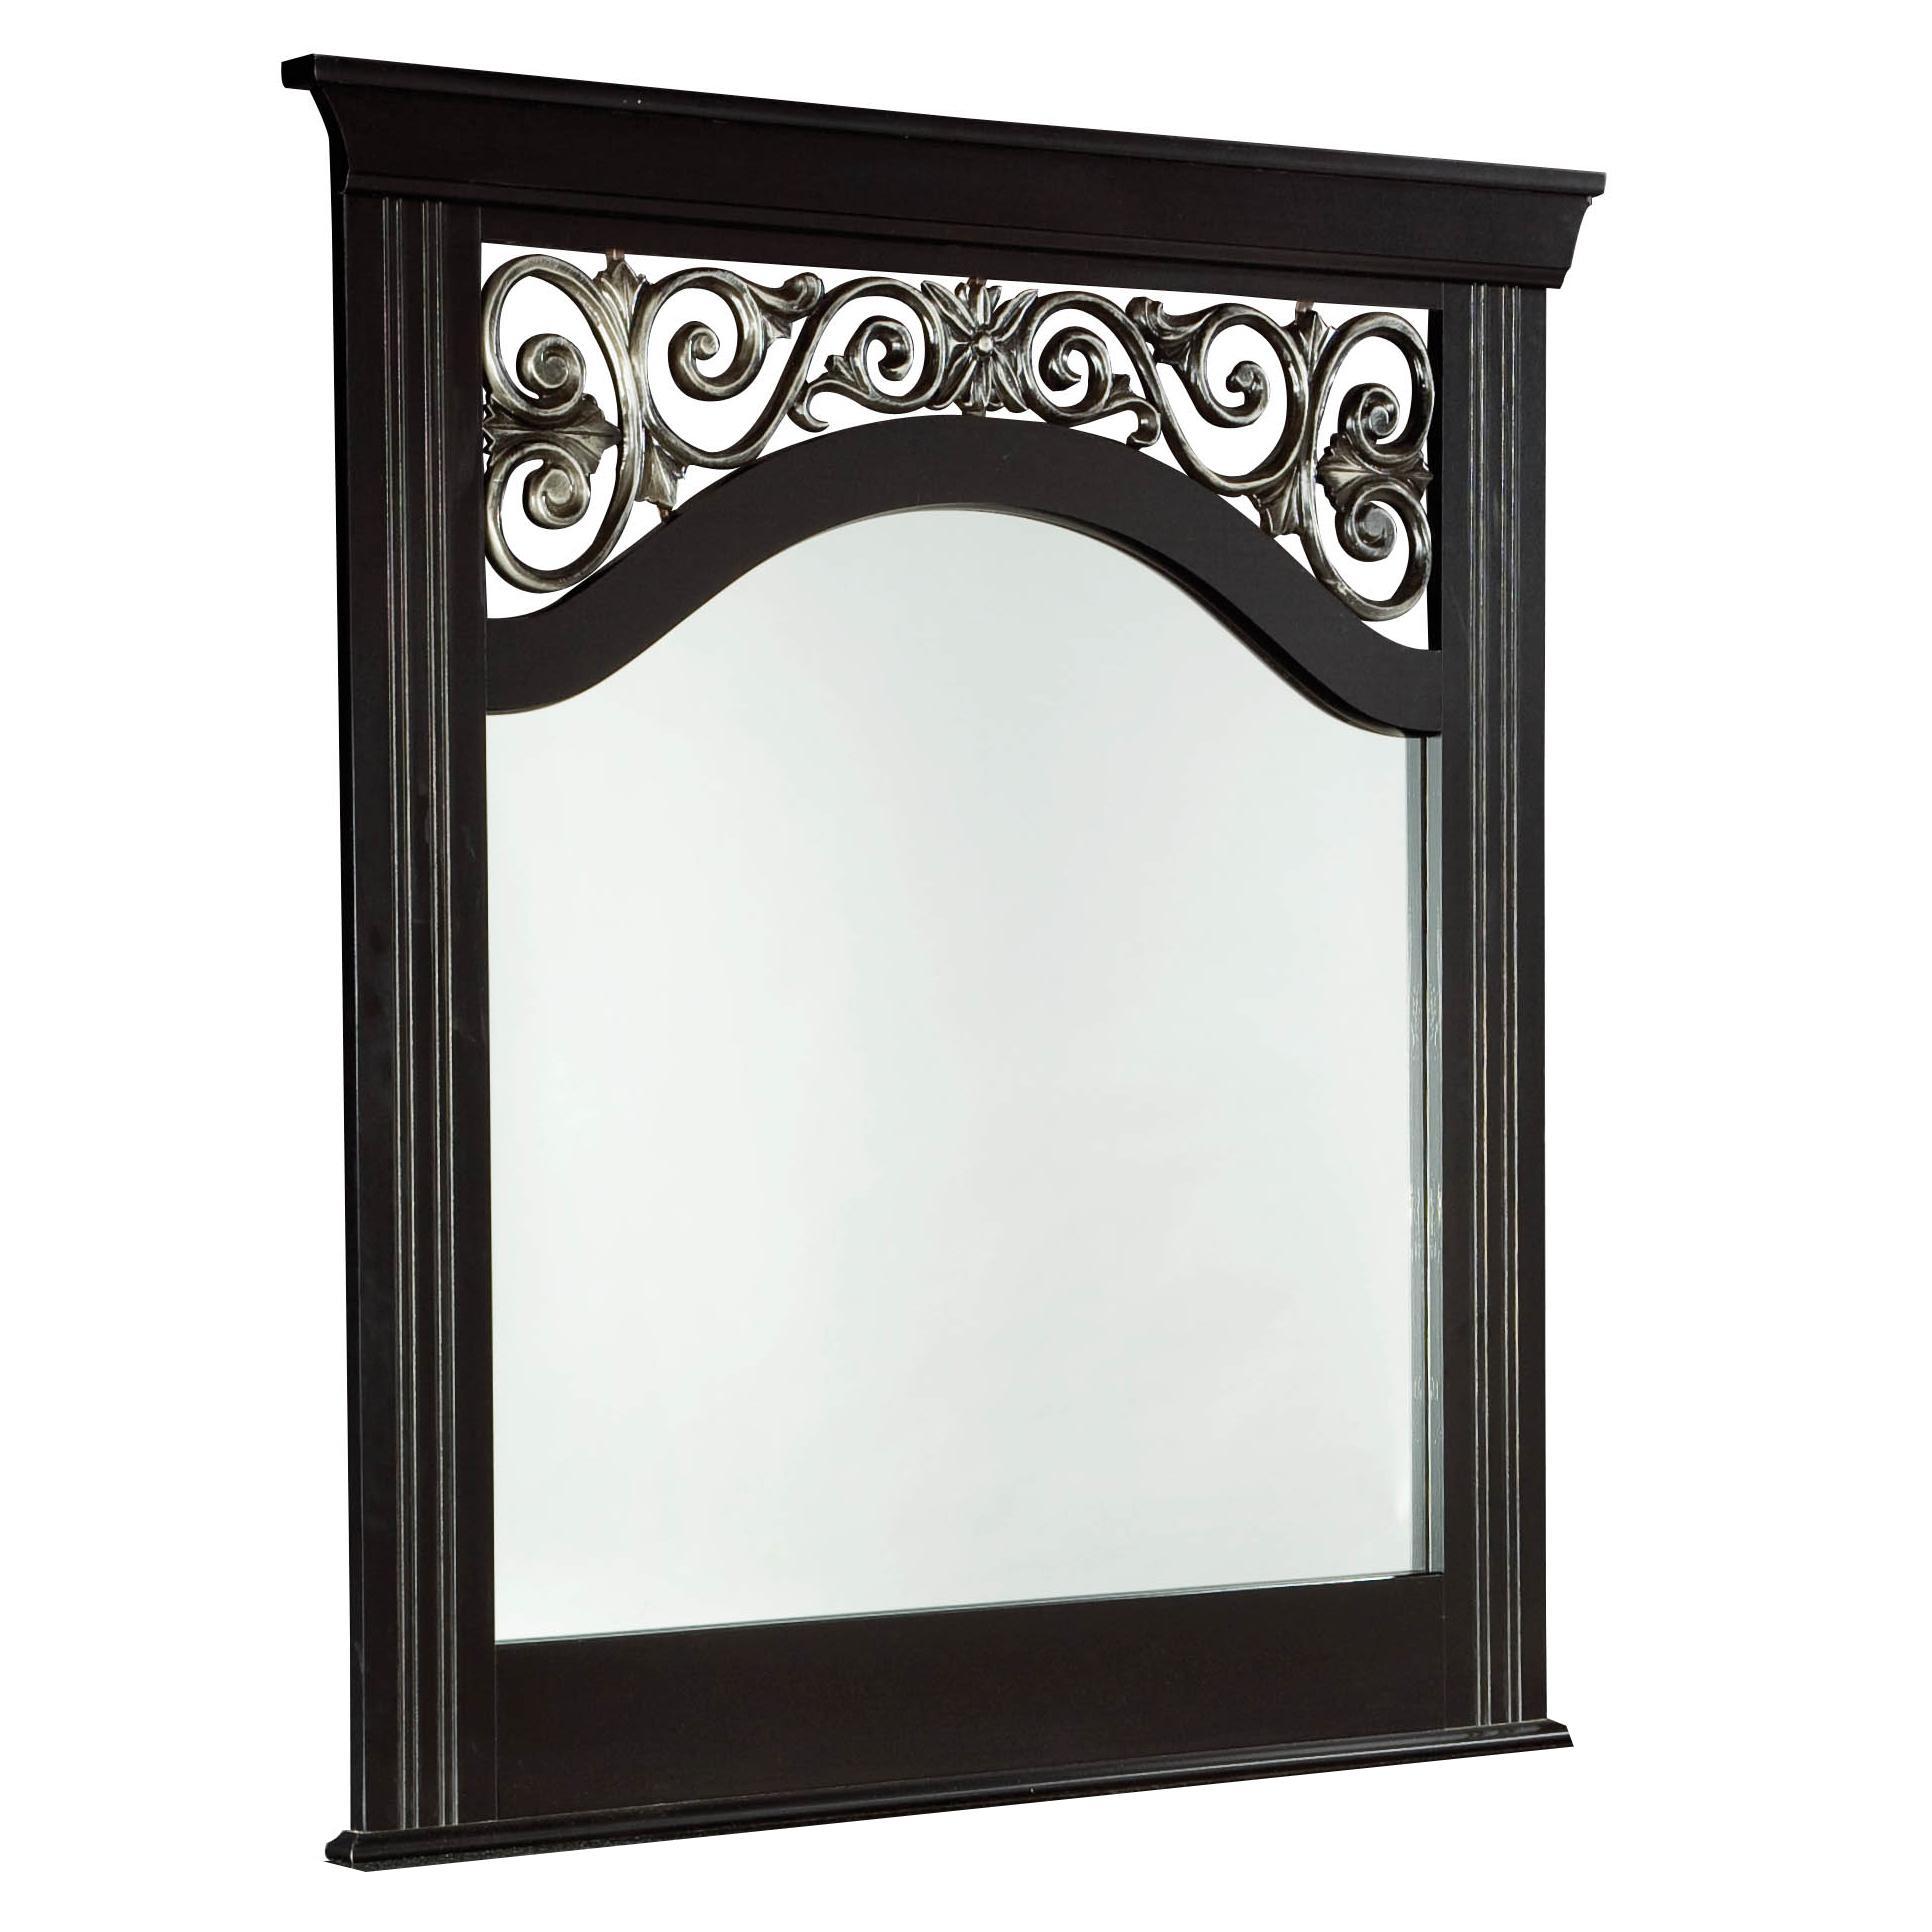 Standard Furniture Madera Panel Mirror - Item Number: 54568